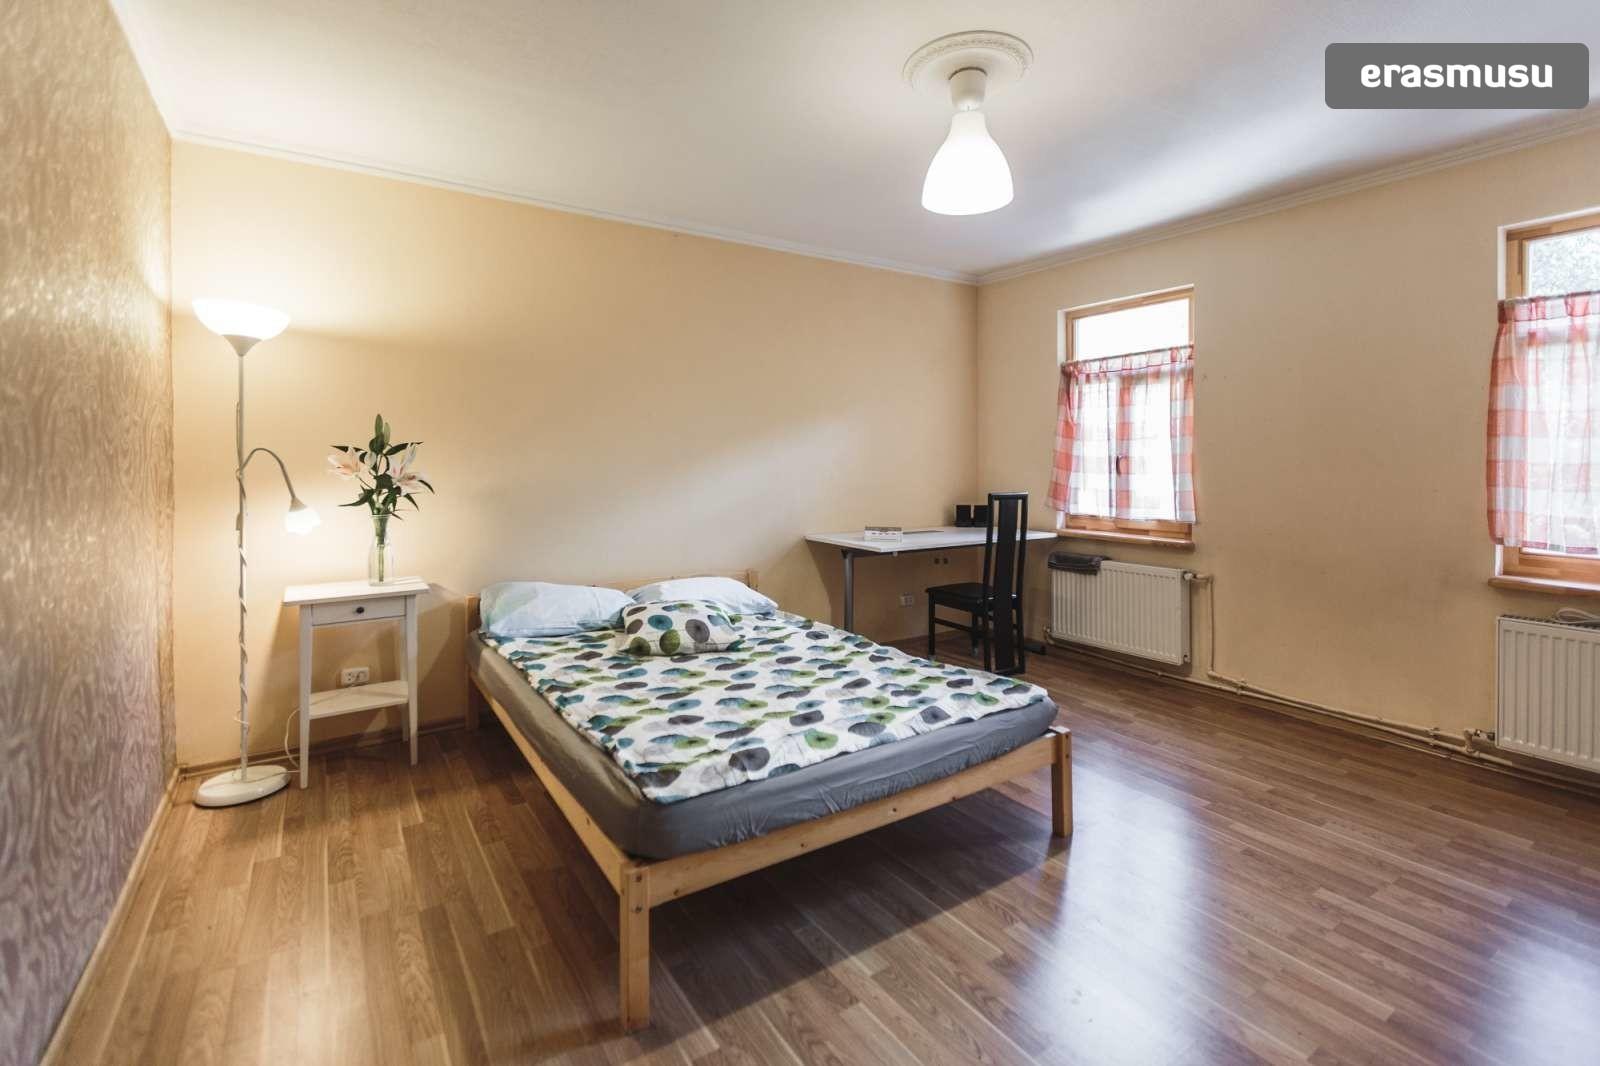 stylish-studio-apartment-rent-avoti-f7e5343ebb53f4ecff15f82d062e